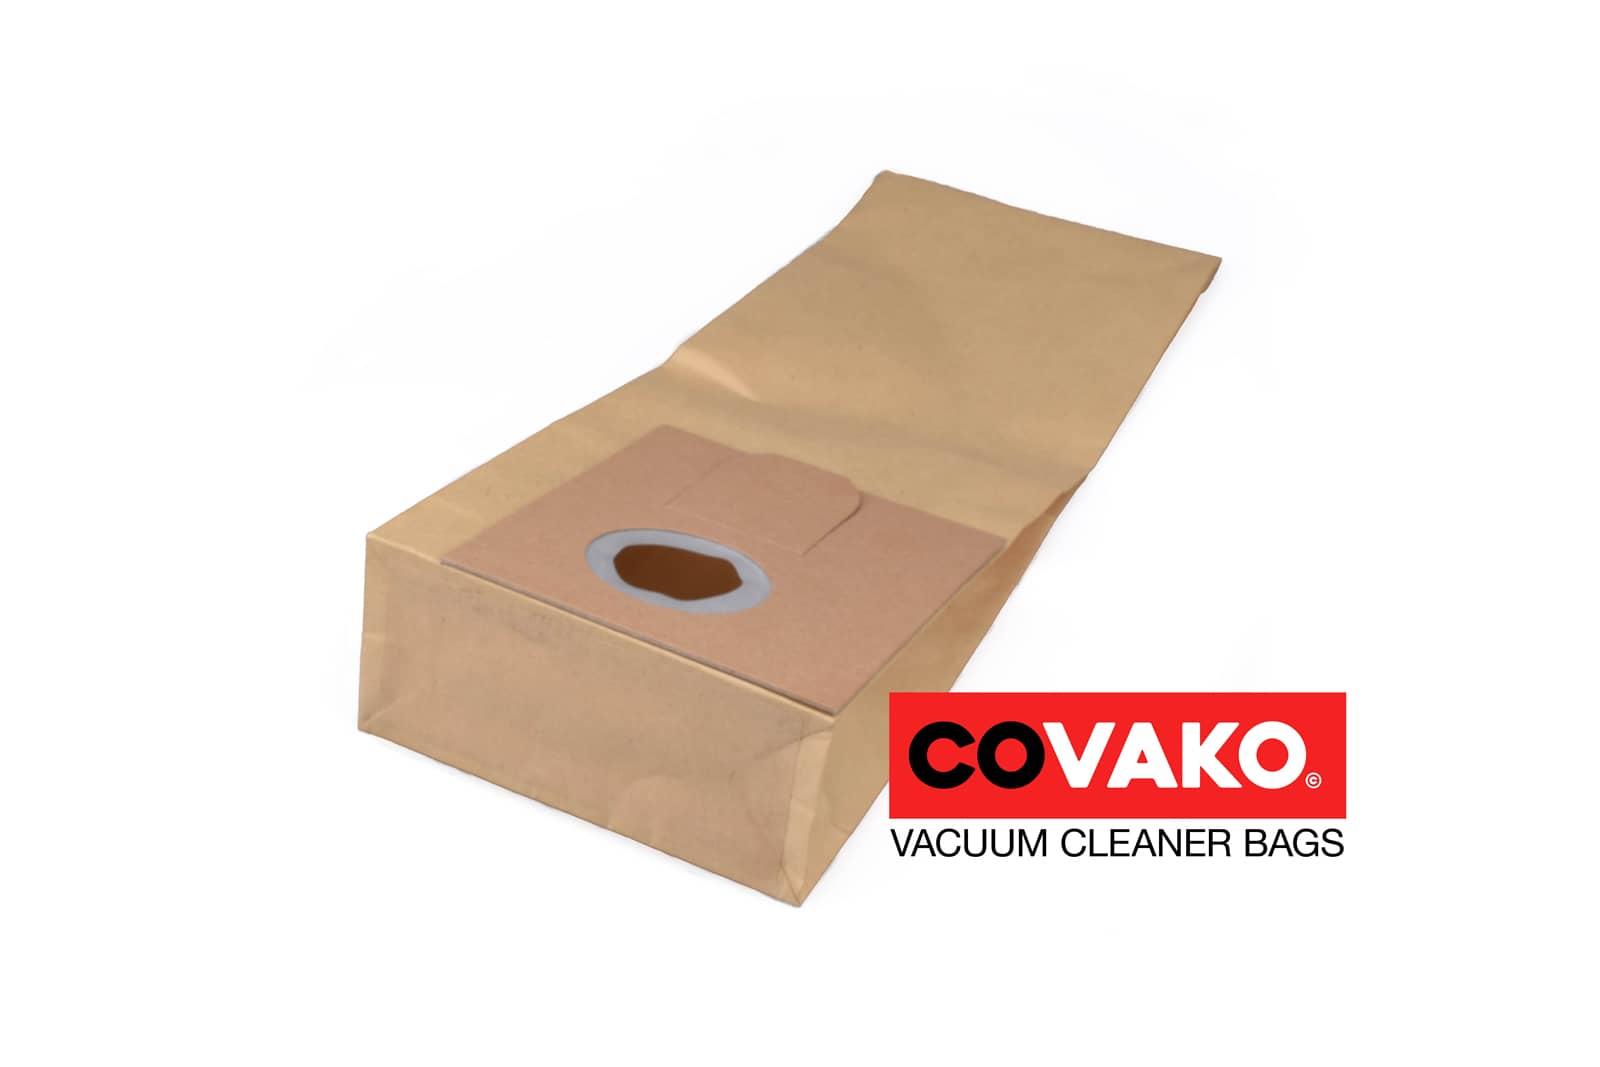 Floormatic QFM 35 / Papier - Floormatic Staubsaugerbeutel